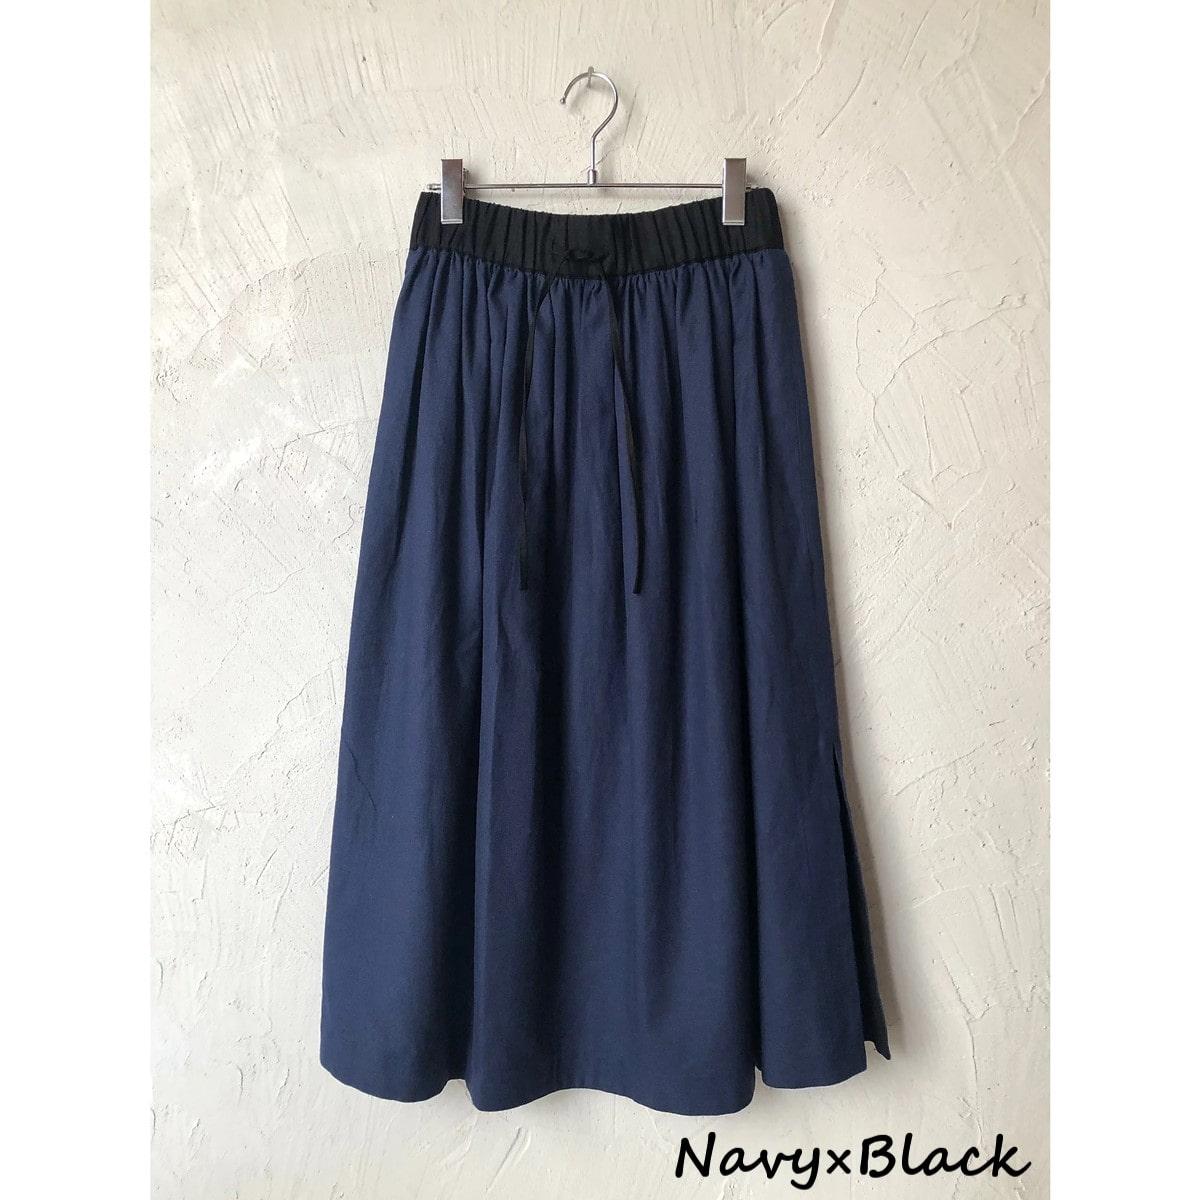 【WOMEN'S】 THE FACTORY L/C ヘリンボーン スカート (3色 Navy×Black/Natural/Brown×Mauve) TF2010703 ザファクトリー リネン 日本製 ウィメンズ レディース 送料無料